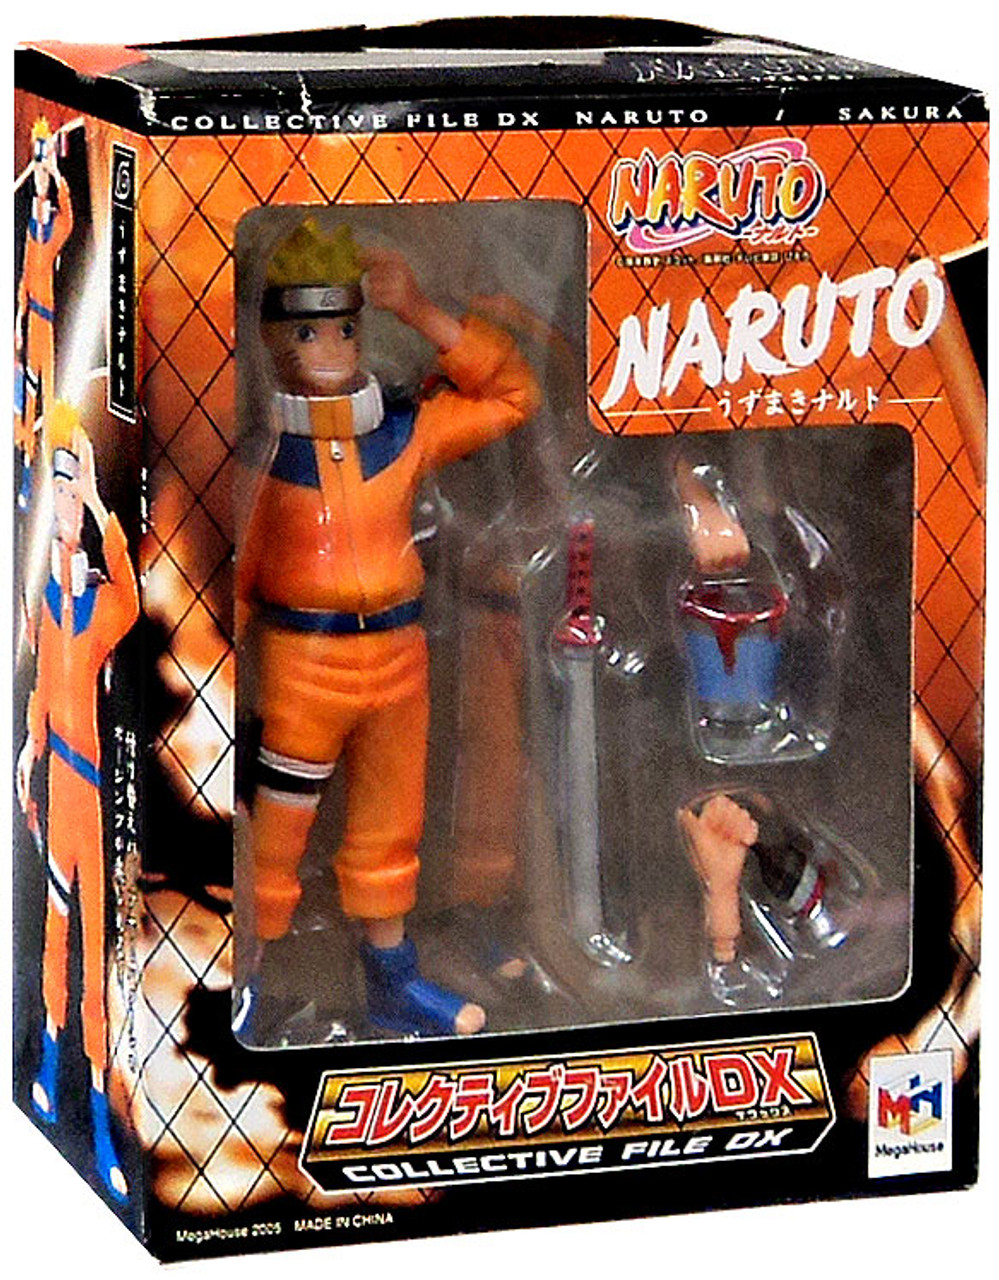 Collective File DX Naruto Uzumaki PVC Figure